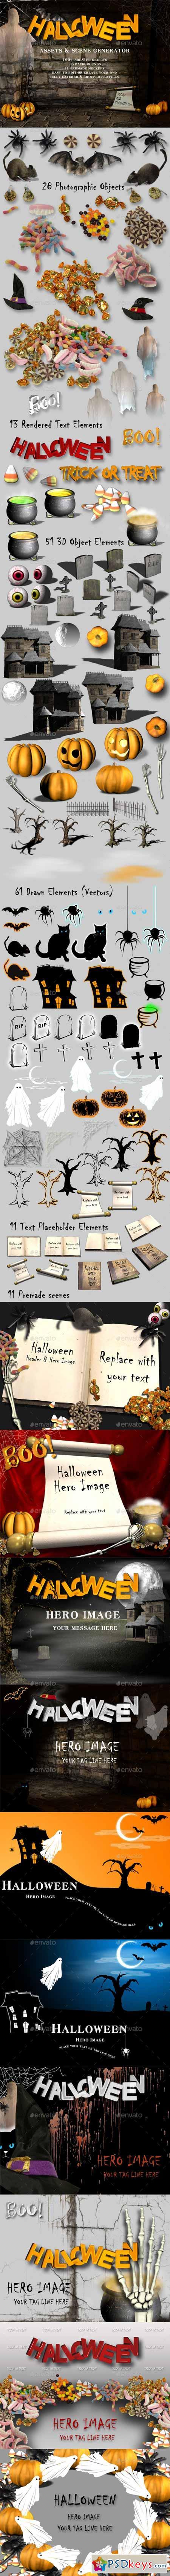 Halloween Assets and Mockup Creator 11863106